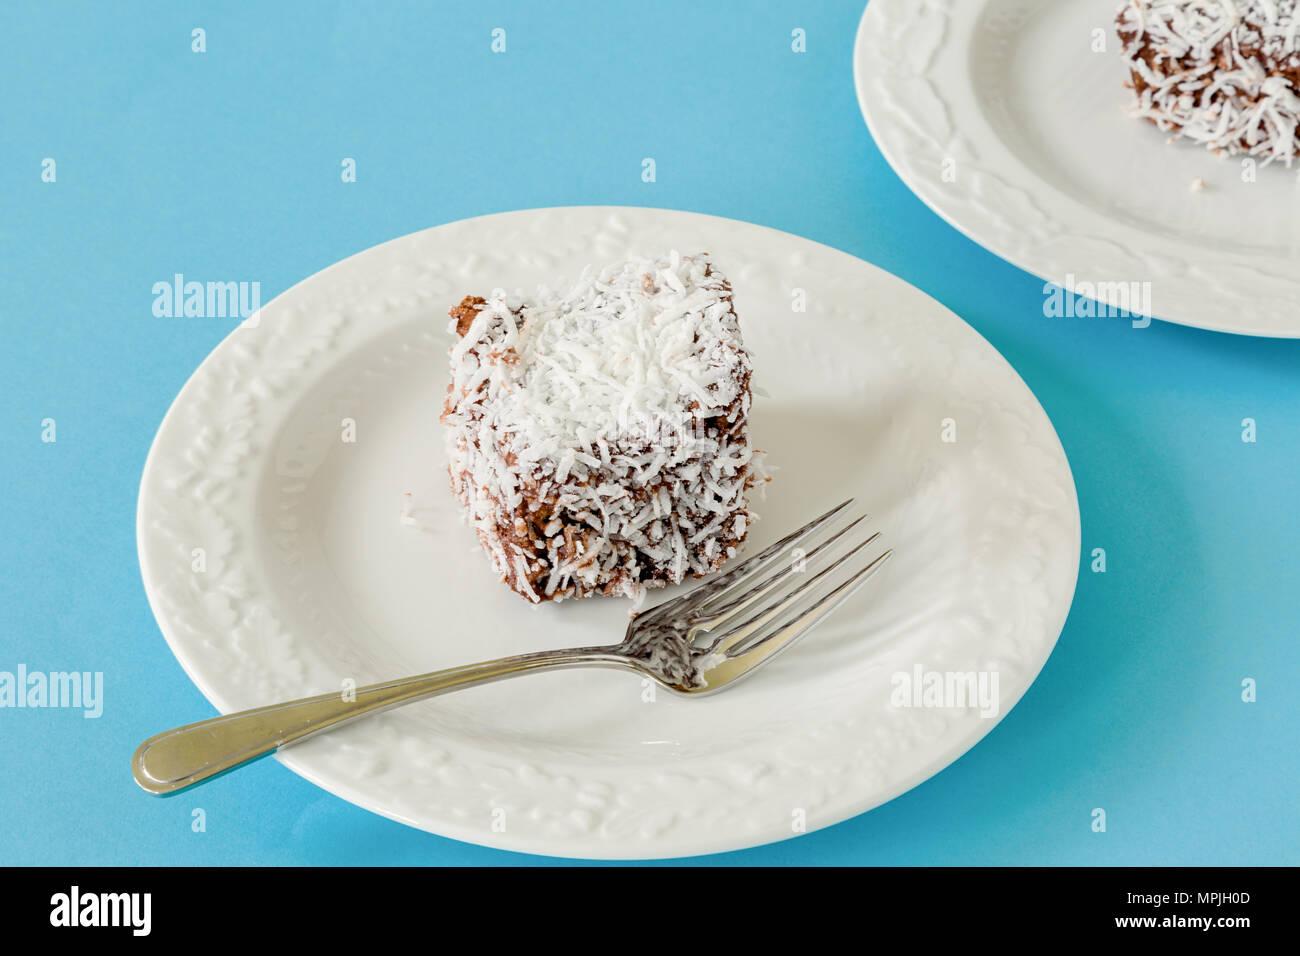 Australian Cuisine Stock Photos & Australian Cuisine Stock Images ...